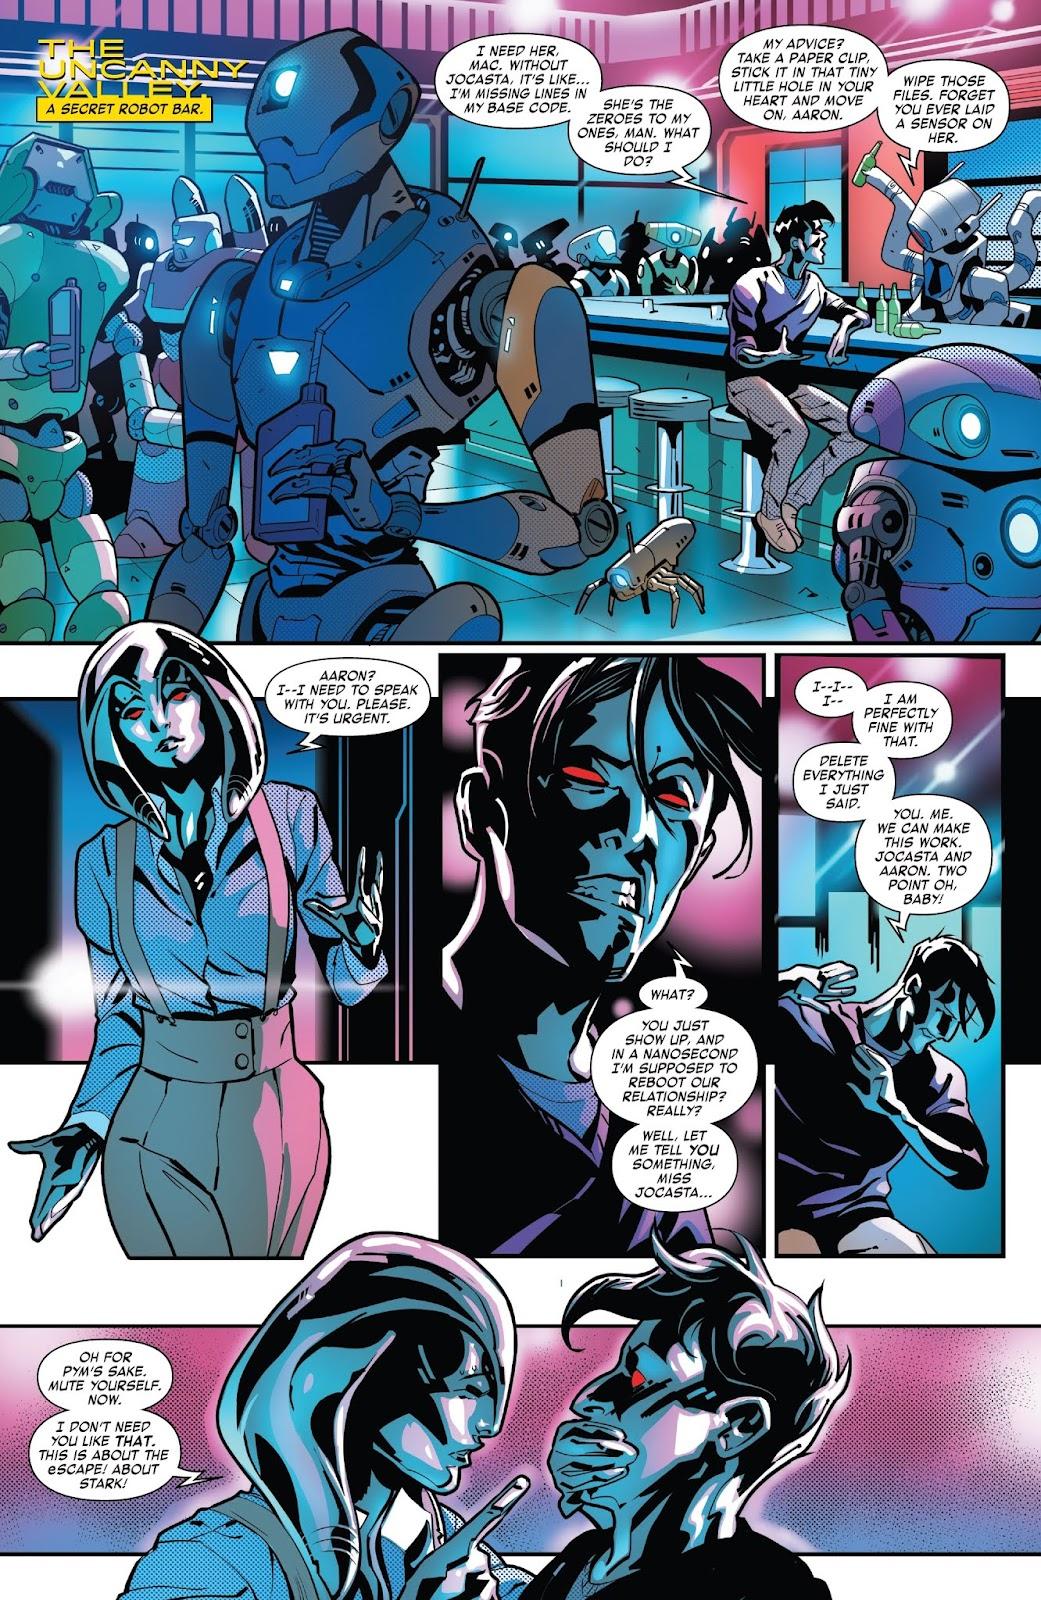 Read online Tony Stark: Iron Man comic -  Issue #7 - 17